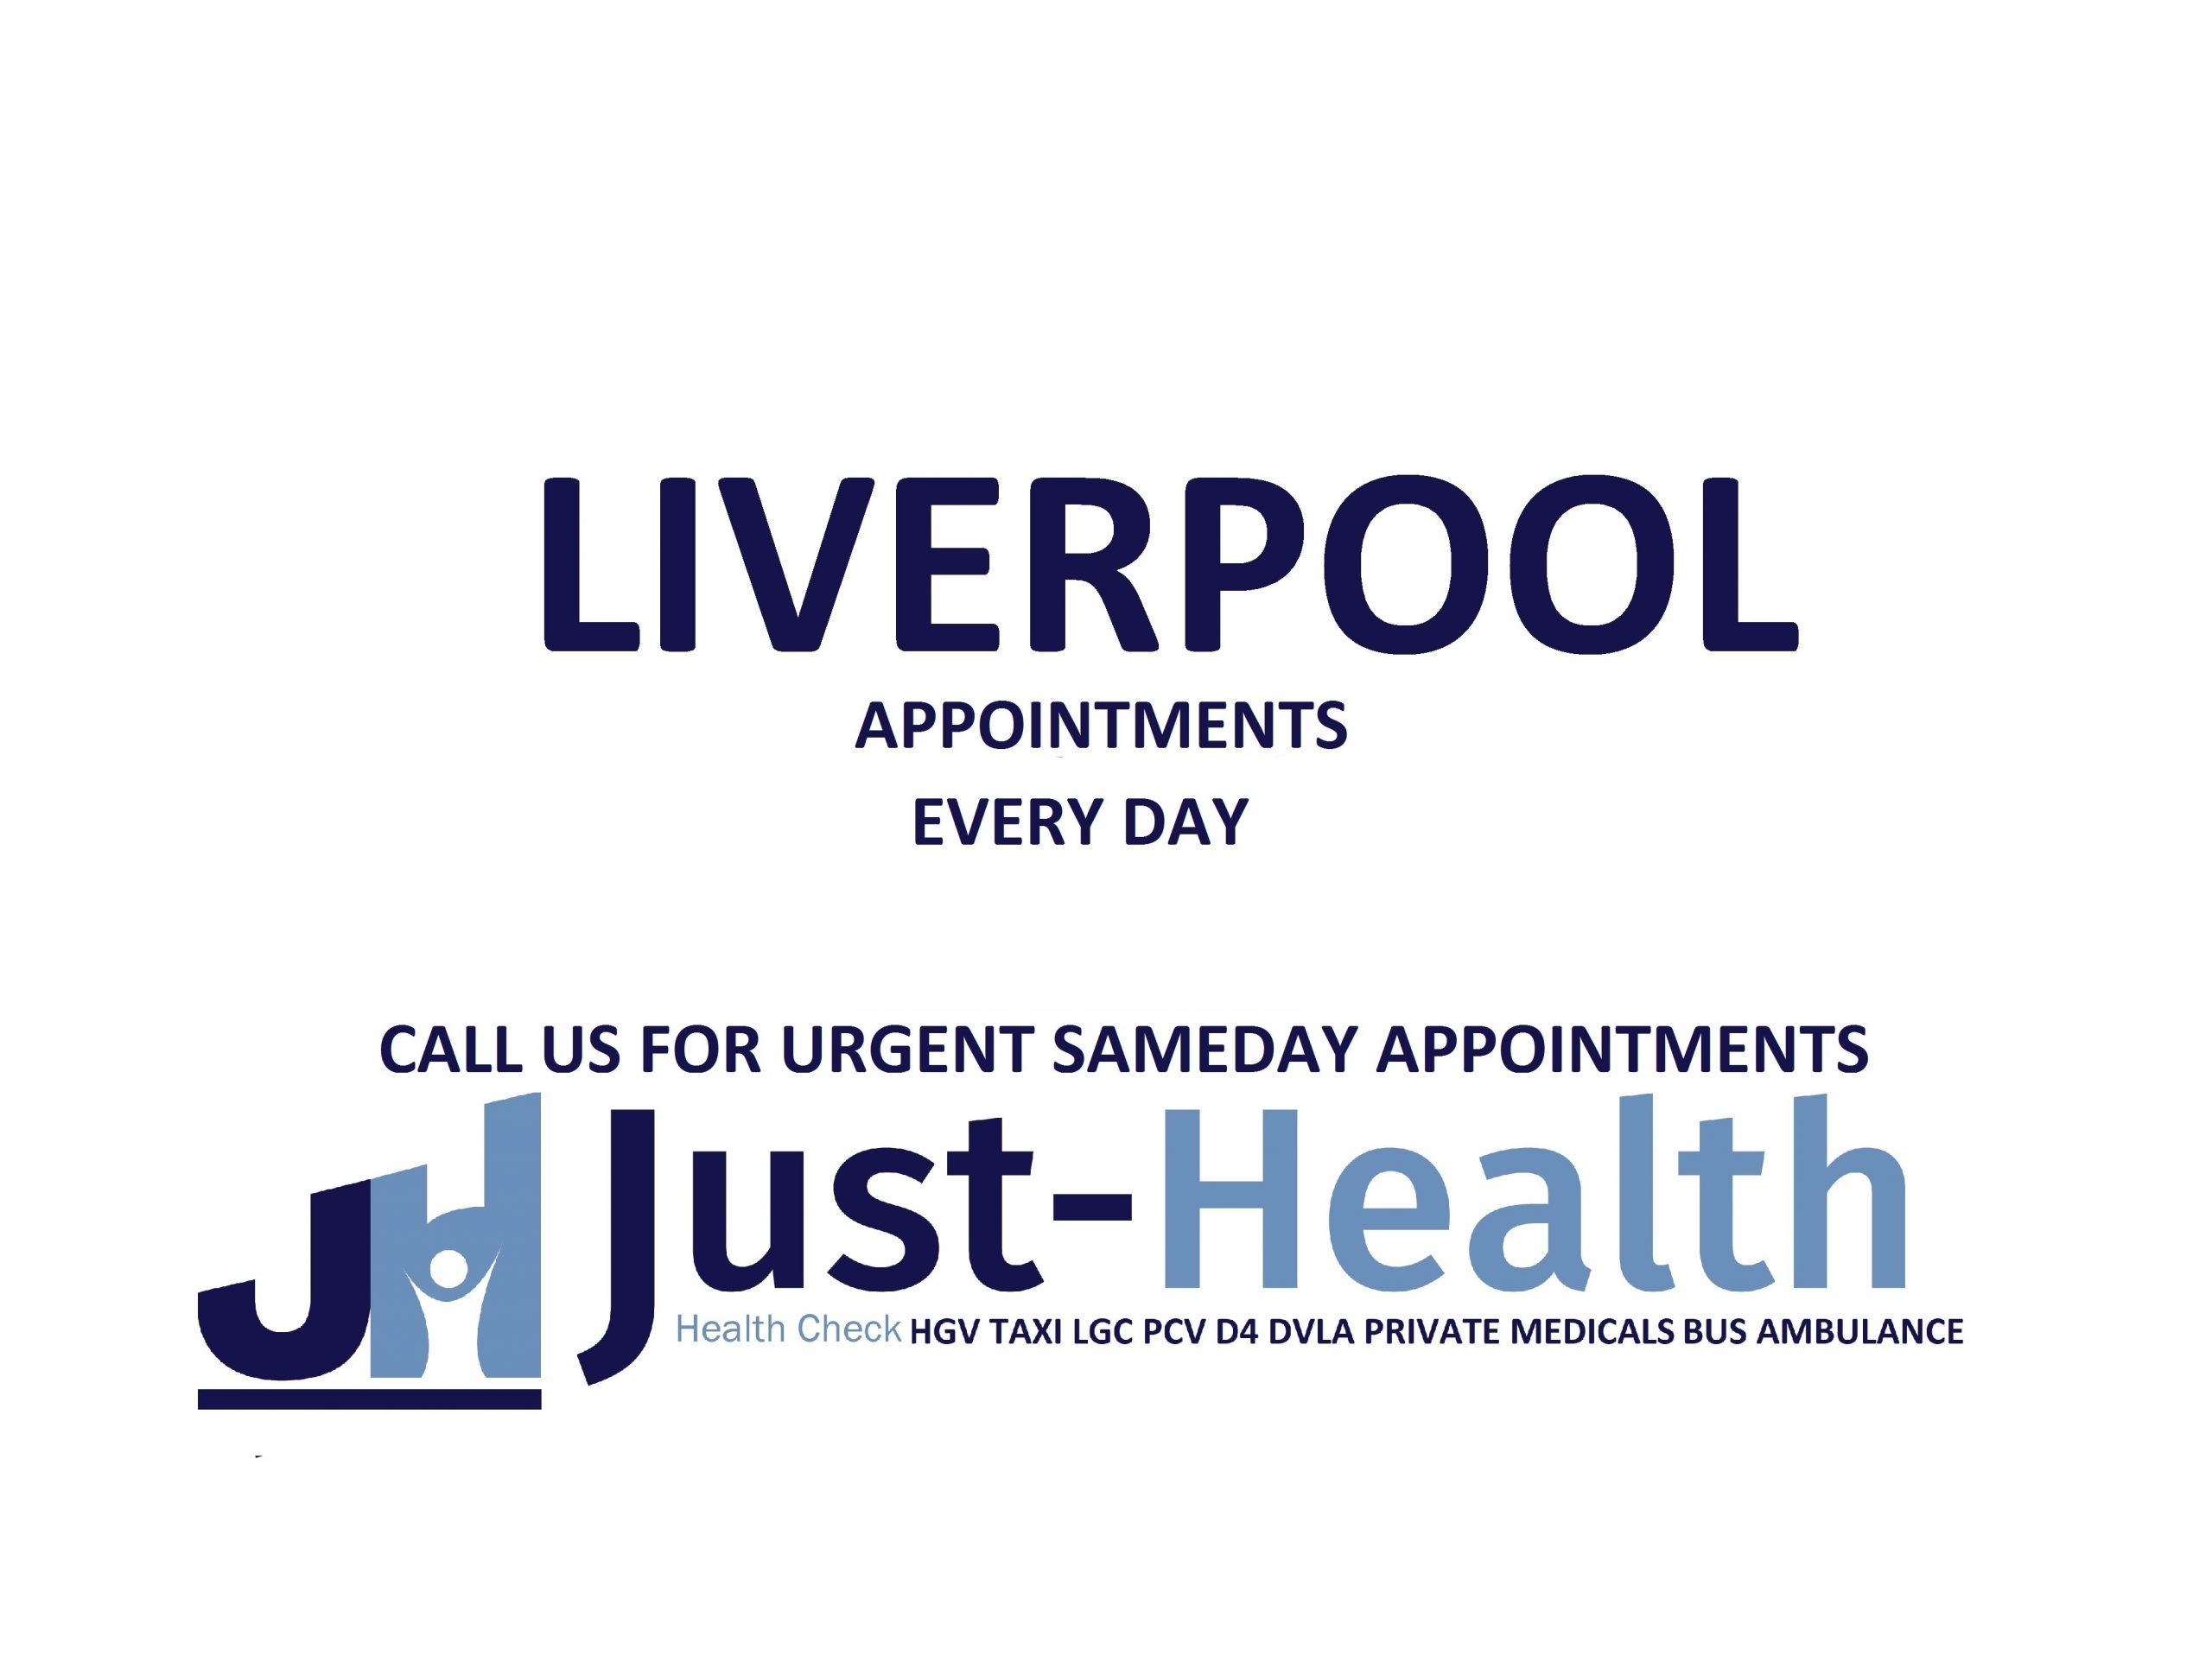 d4 PSV LGV Taxi Pcv HGV medical just health clinic Liverpool merseyside docks birkenhead wallasey wirral